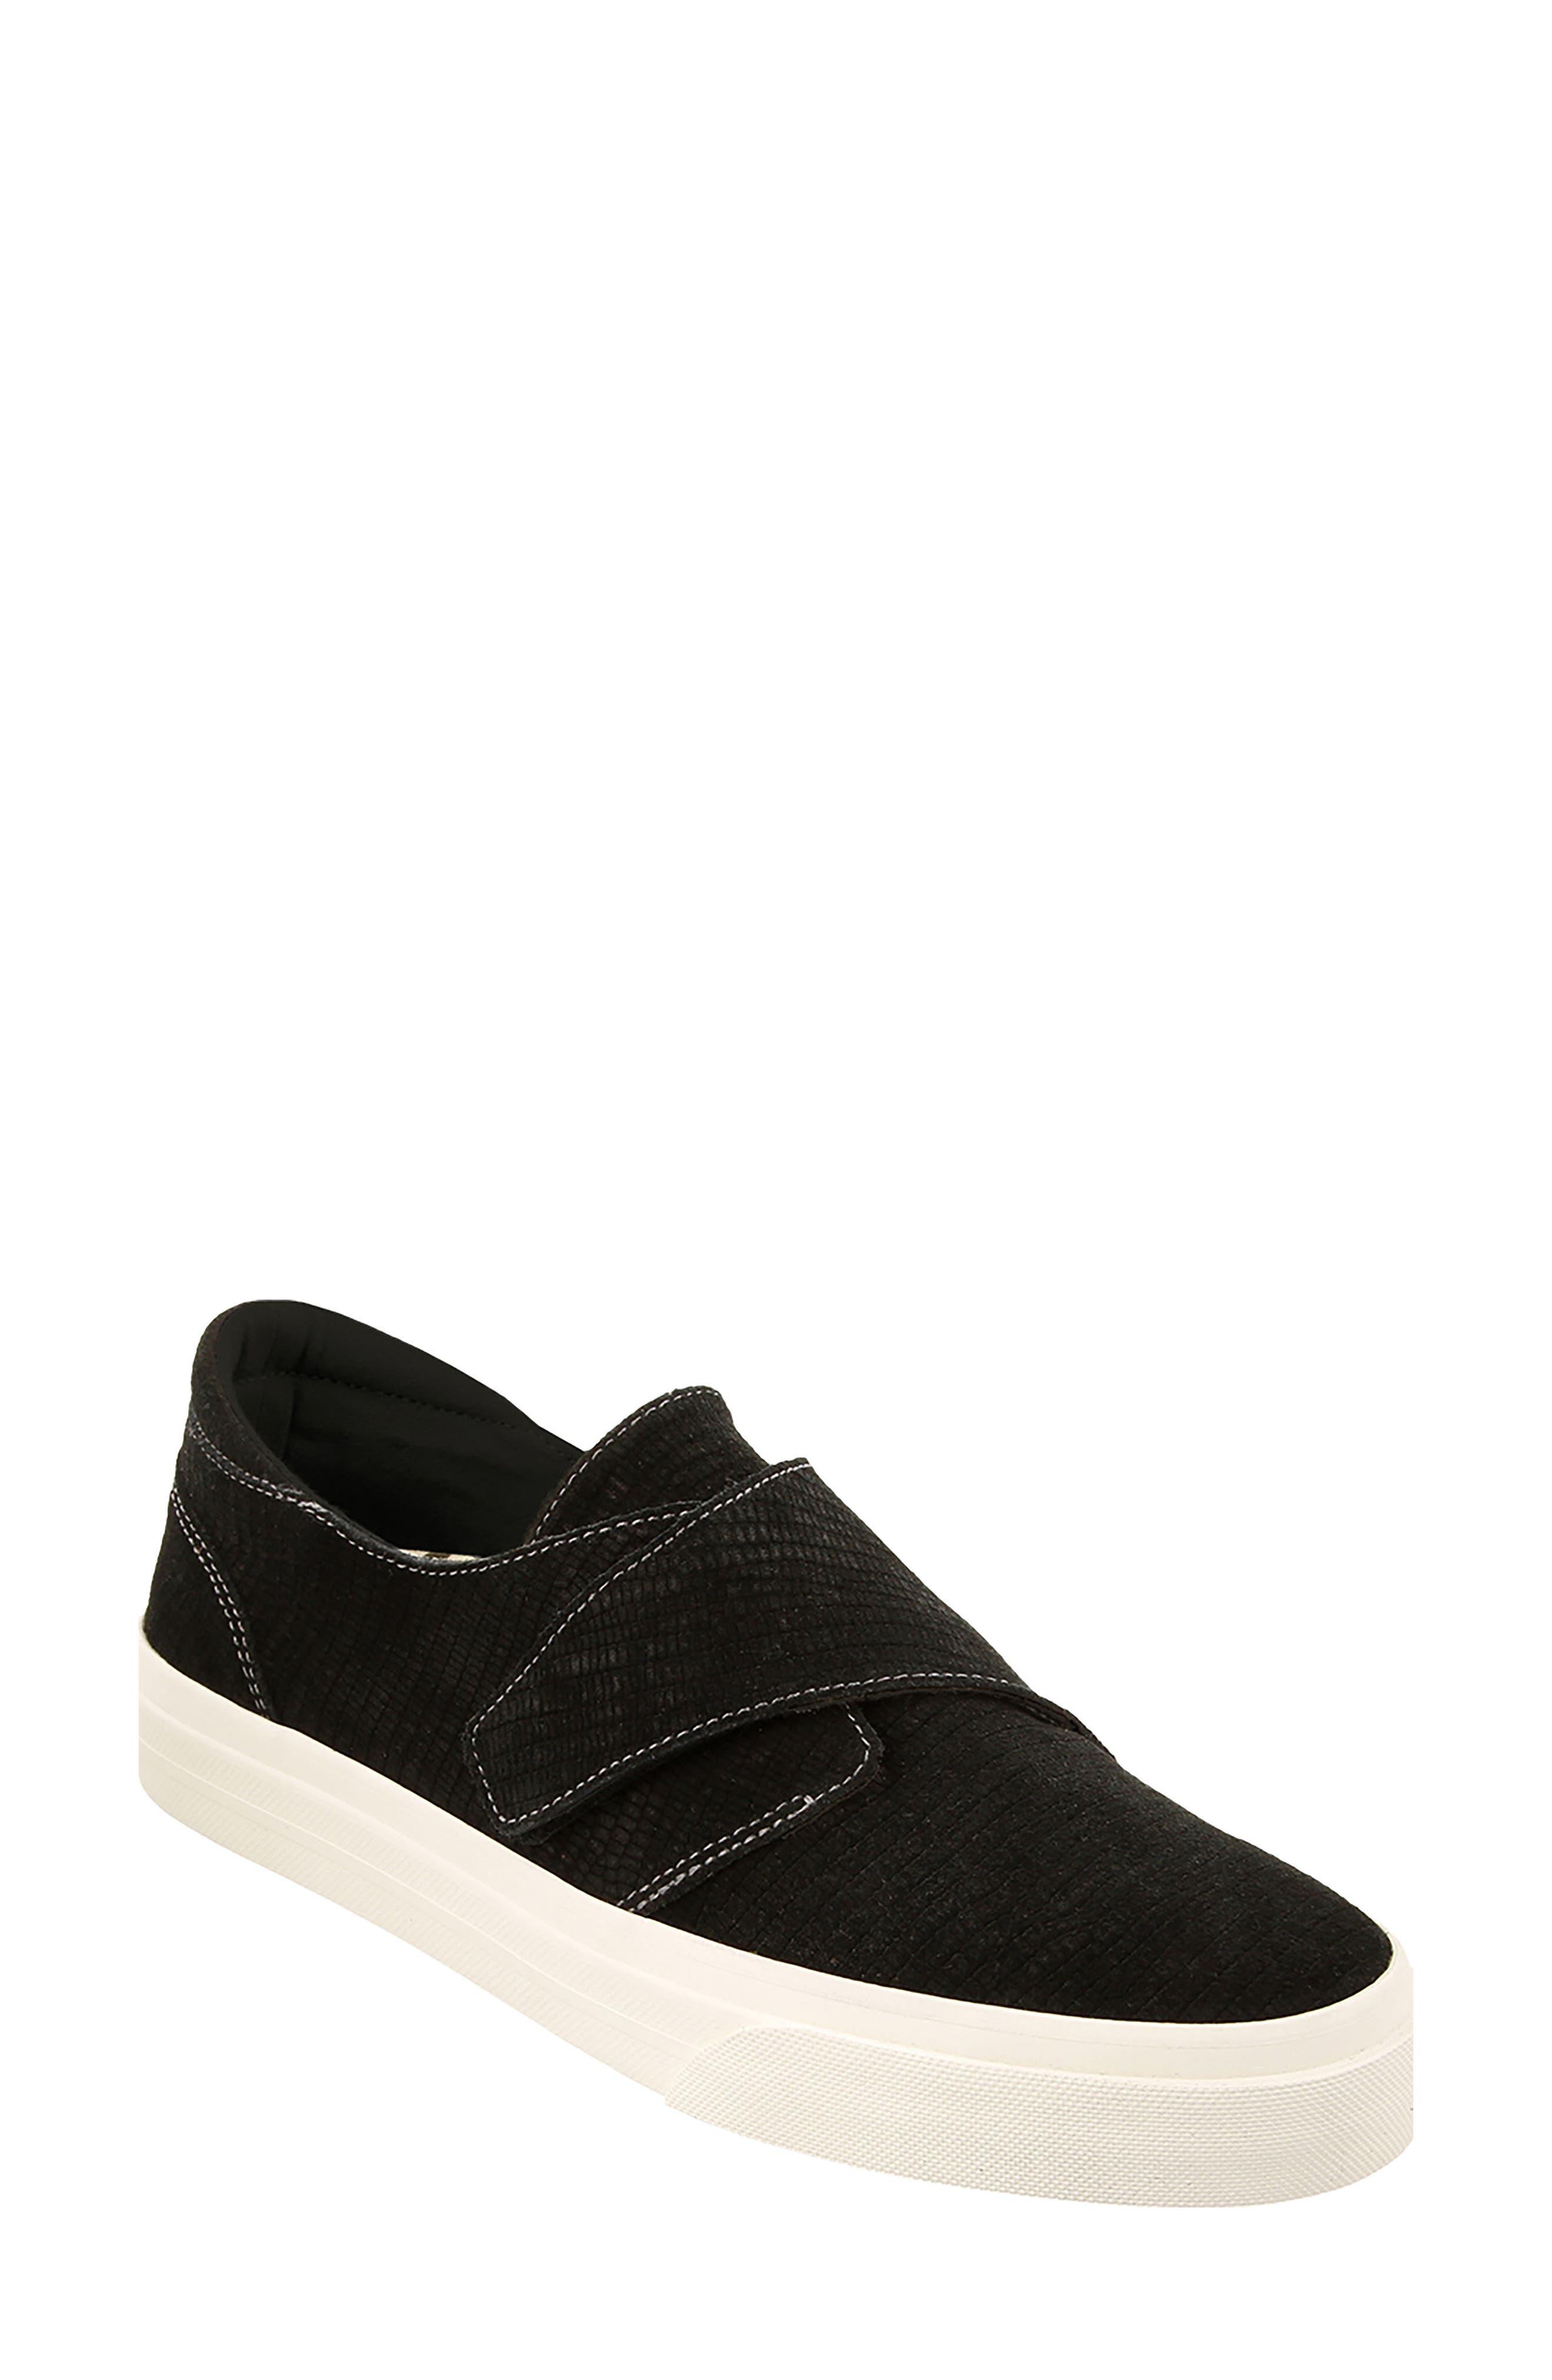 Soul Sneaker,                         Main,                         color, Black Emboss Suede